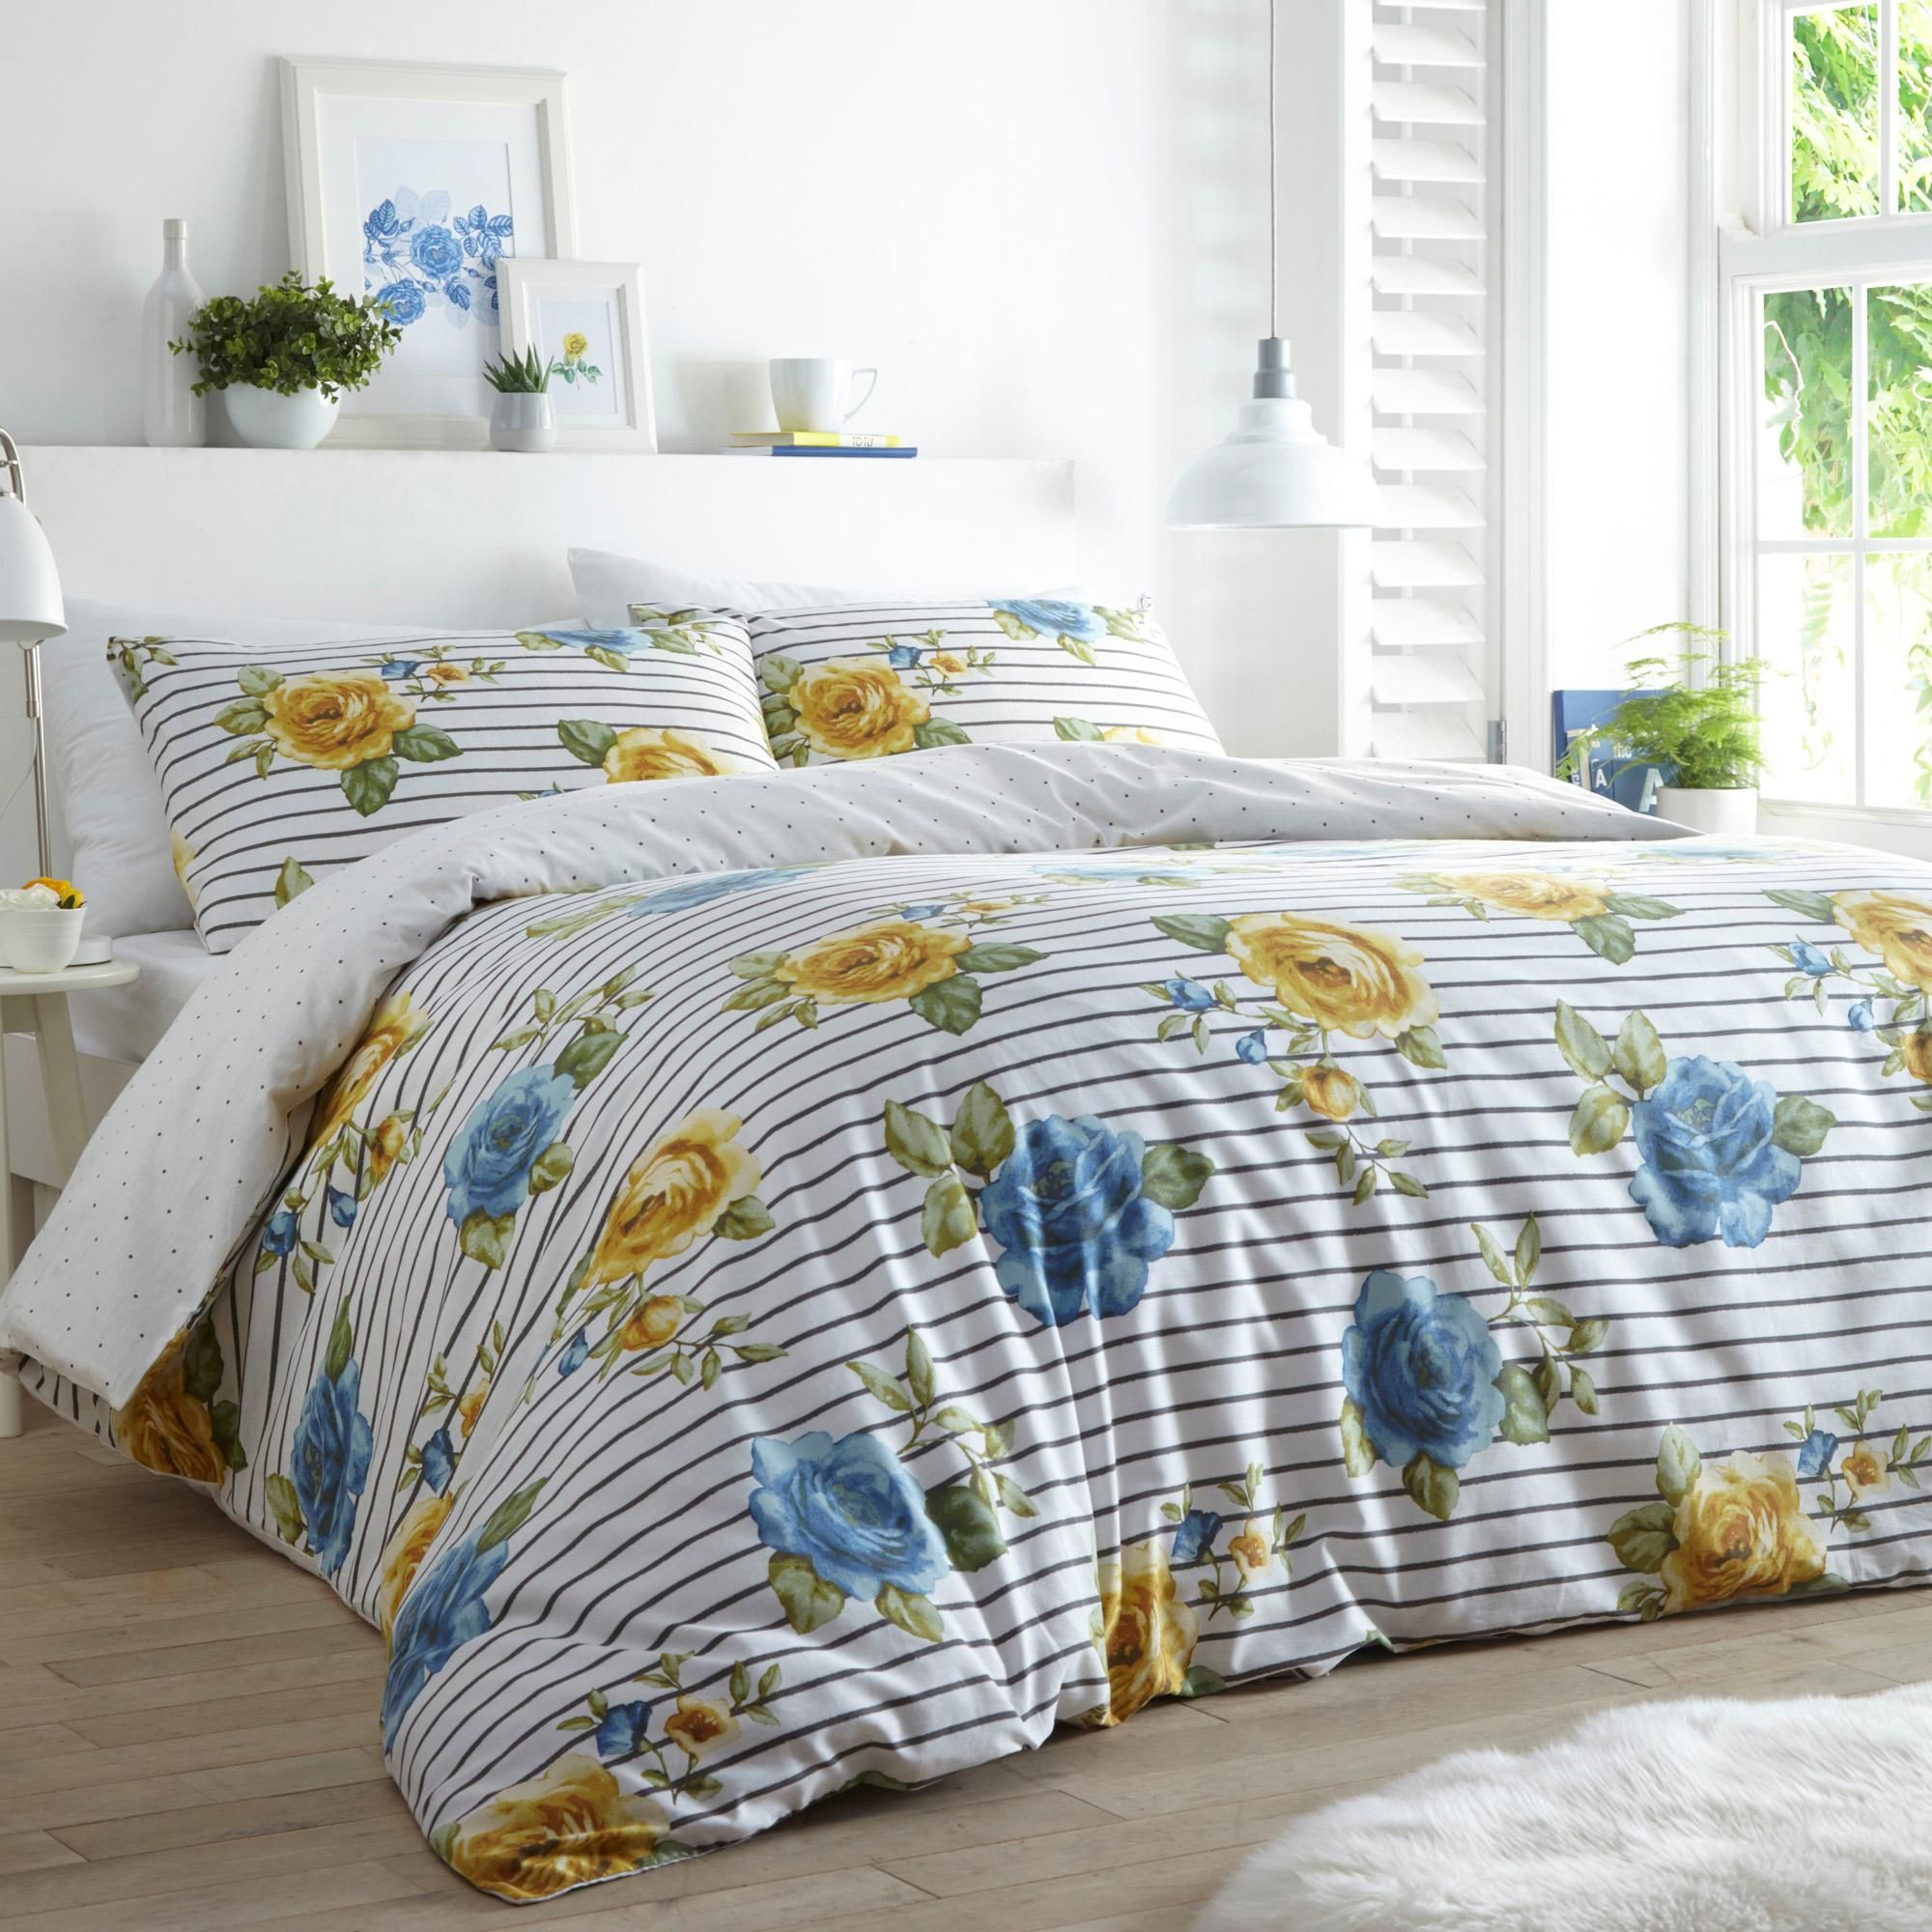 Rapport Havana Blue Duvet Cover Set Reversible Bedding Set